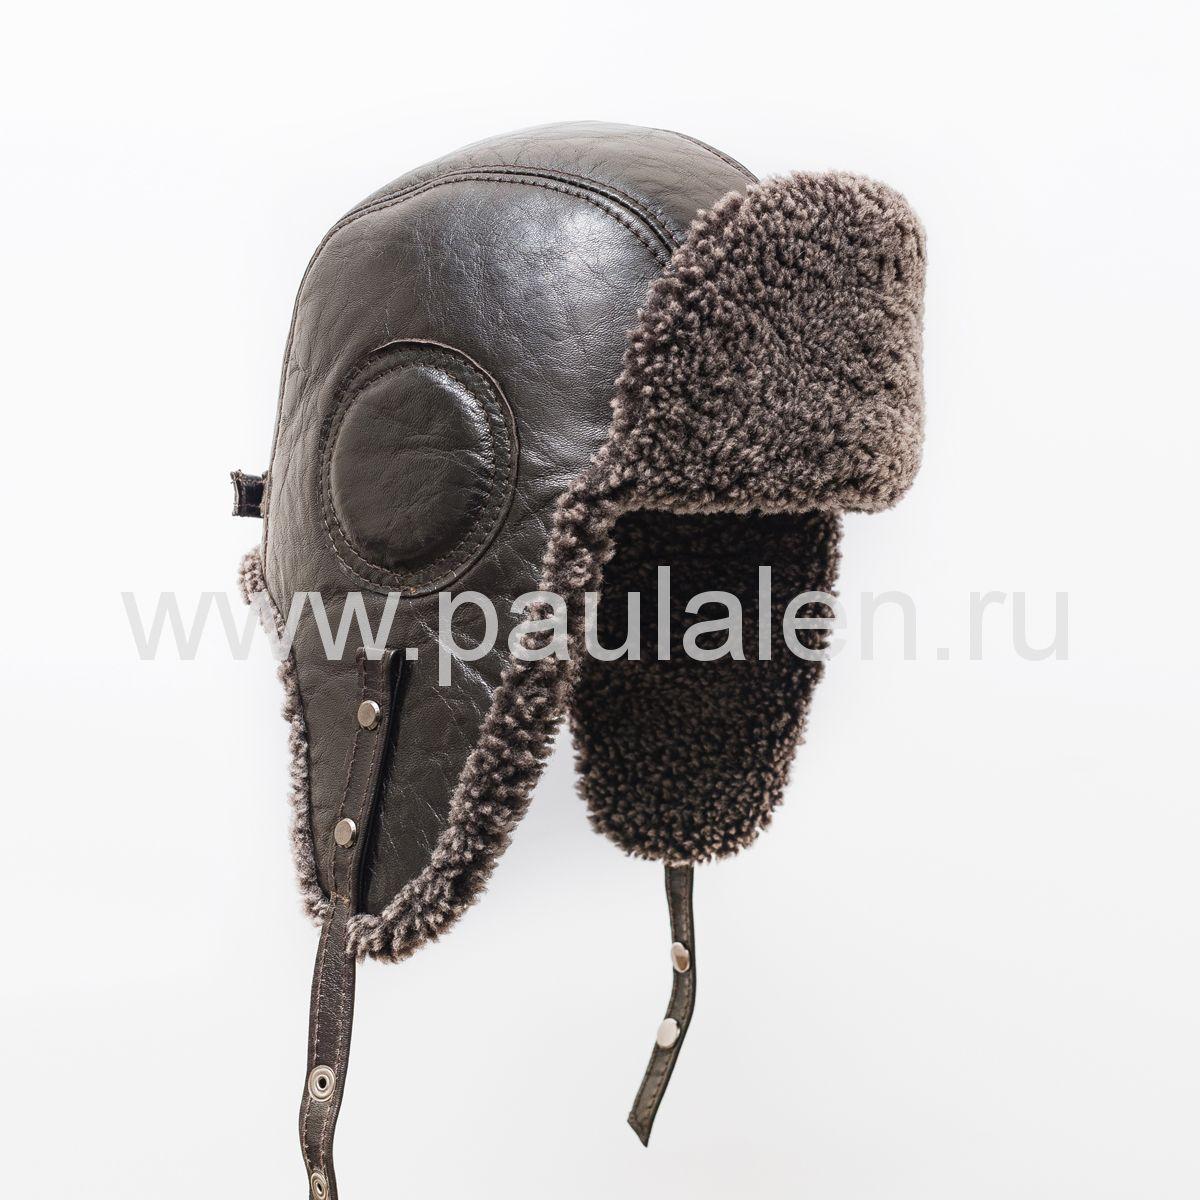 "Мужская шапка ушанка ""Авиатор"" из кожи и меха овчины. Артикул B034"